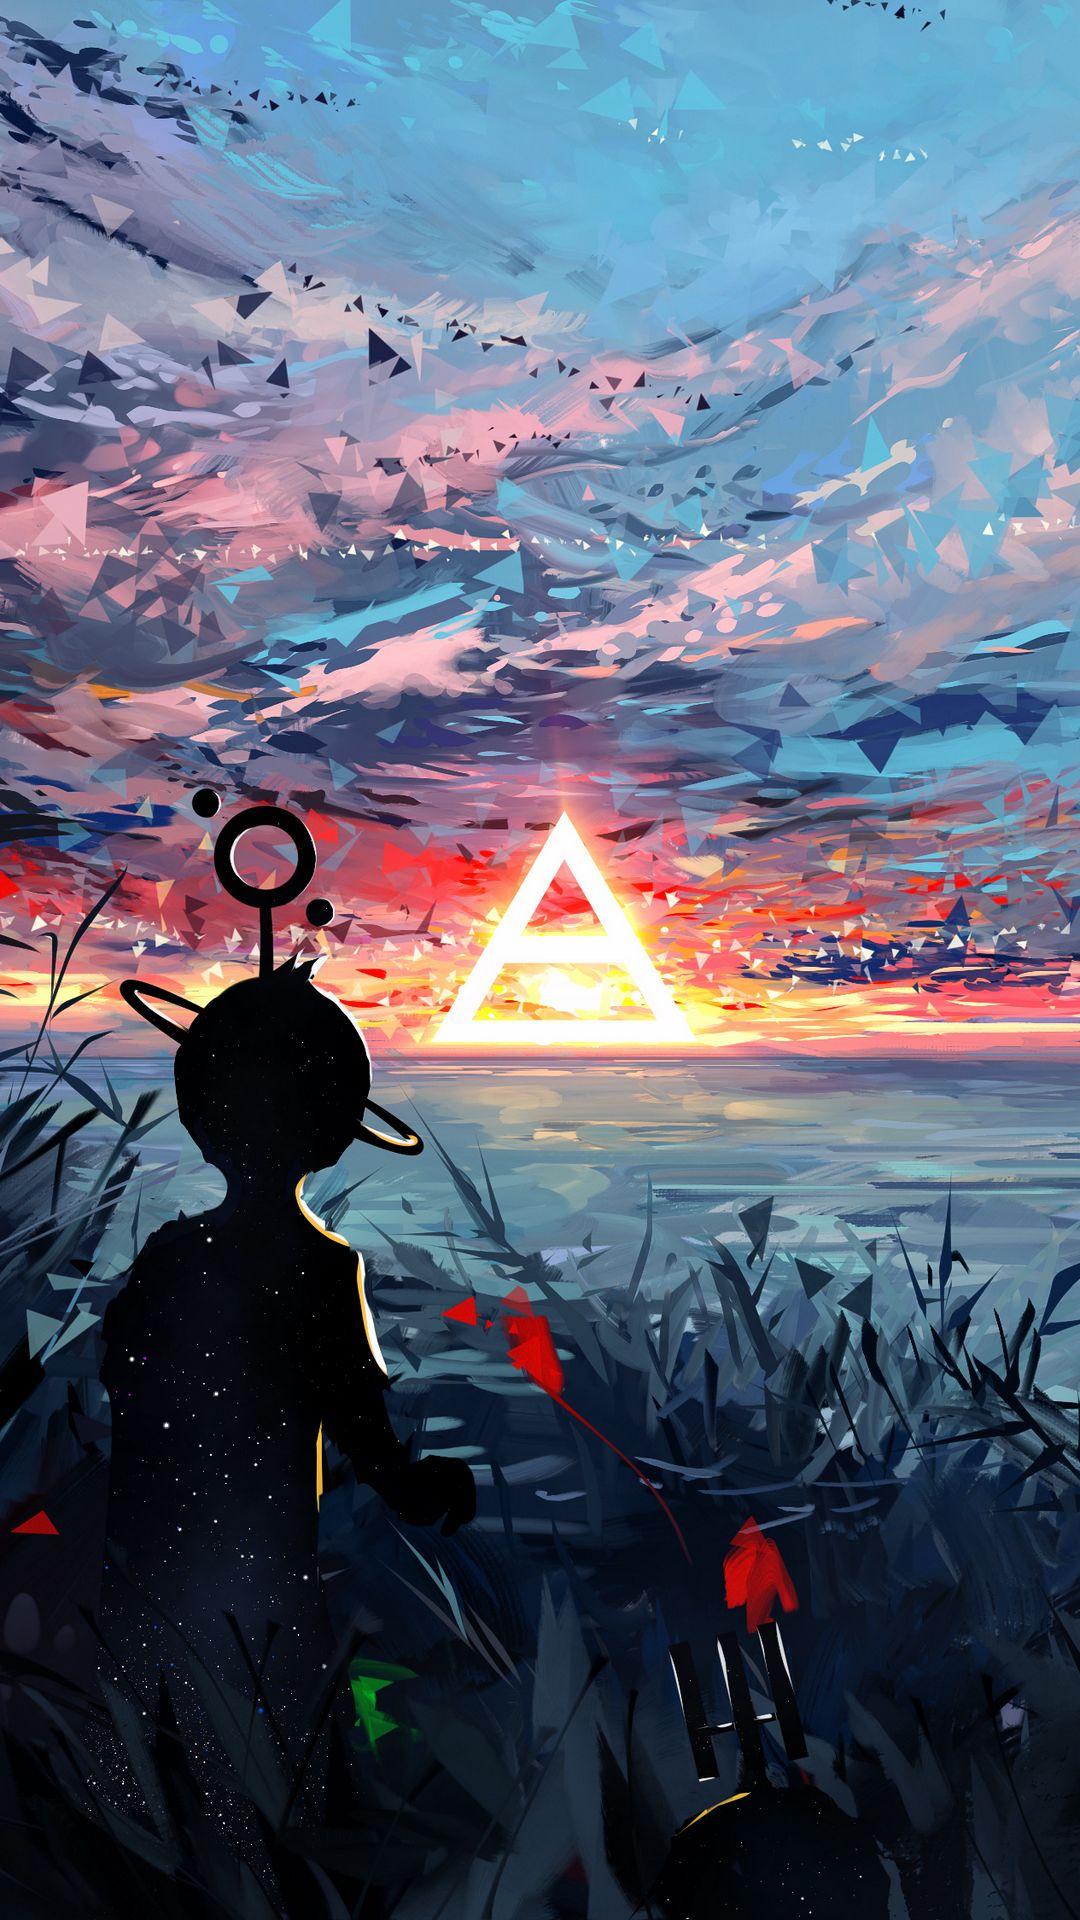 1080x1920 Wallpaper silhouette, art, sky, spots, colorful